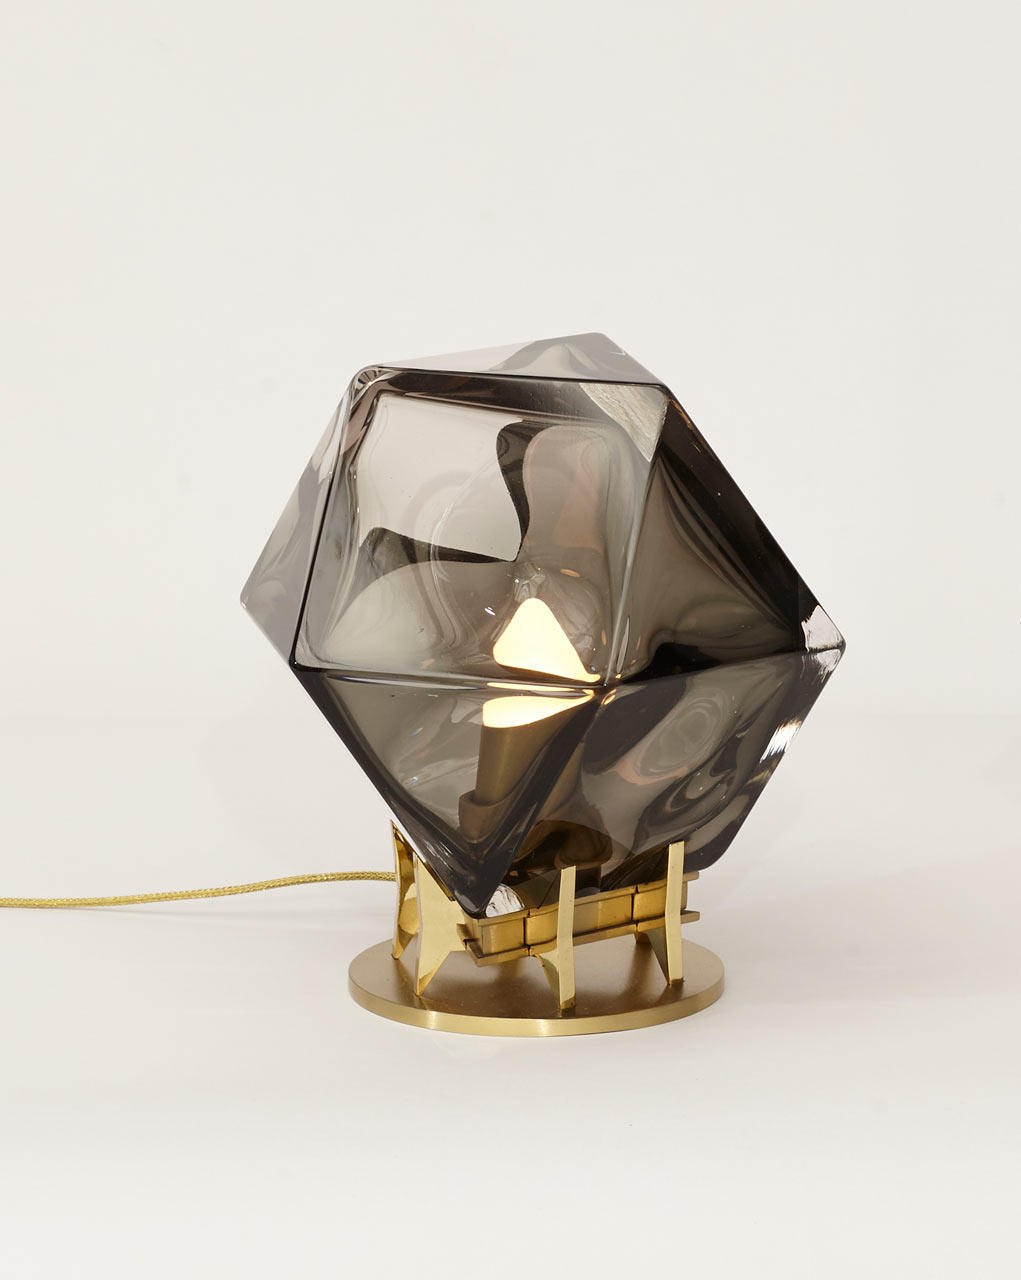 Welles double blown lamp by Gabriel Scott